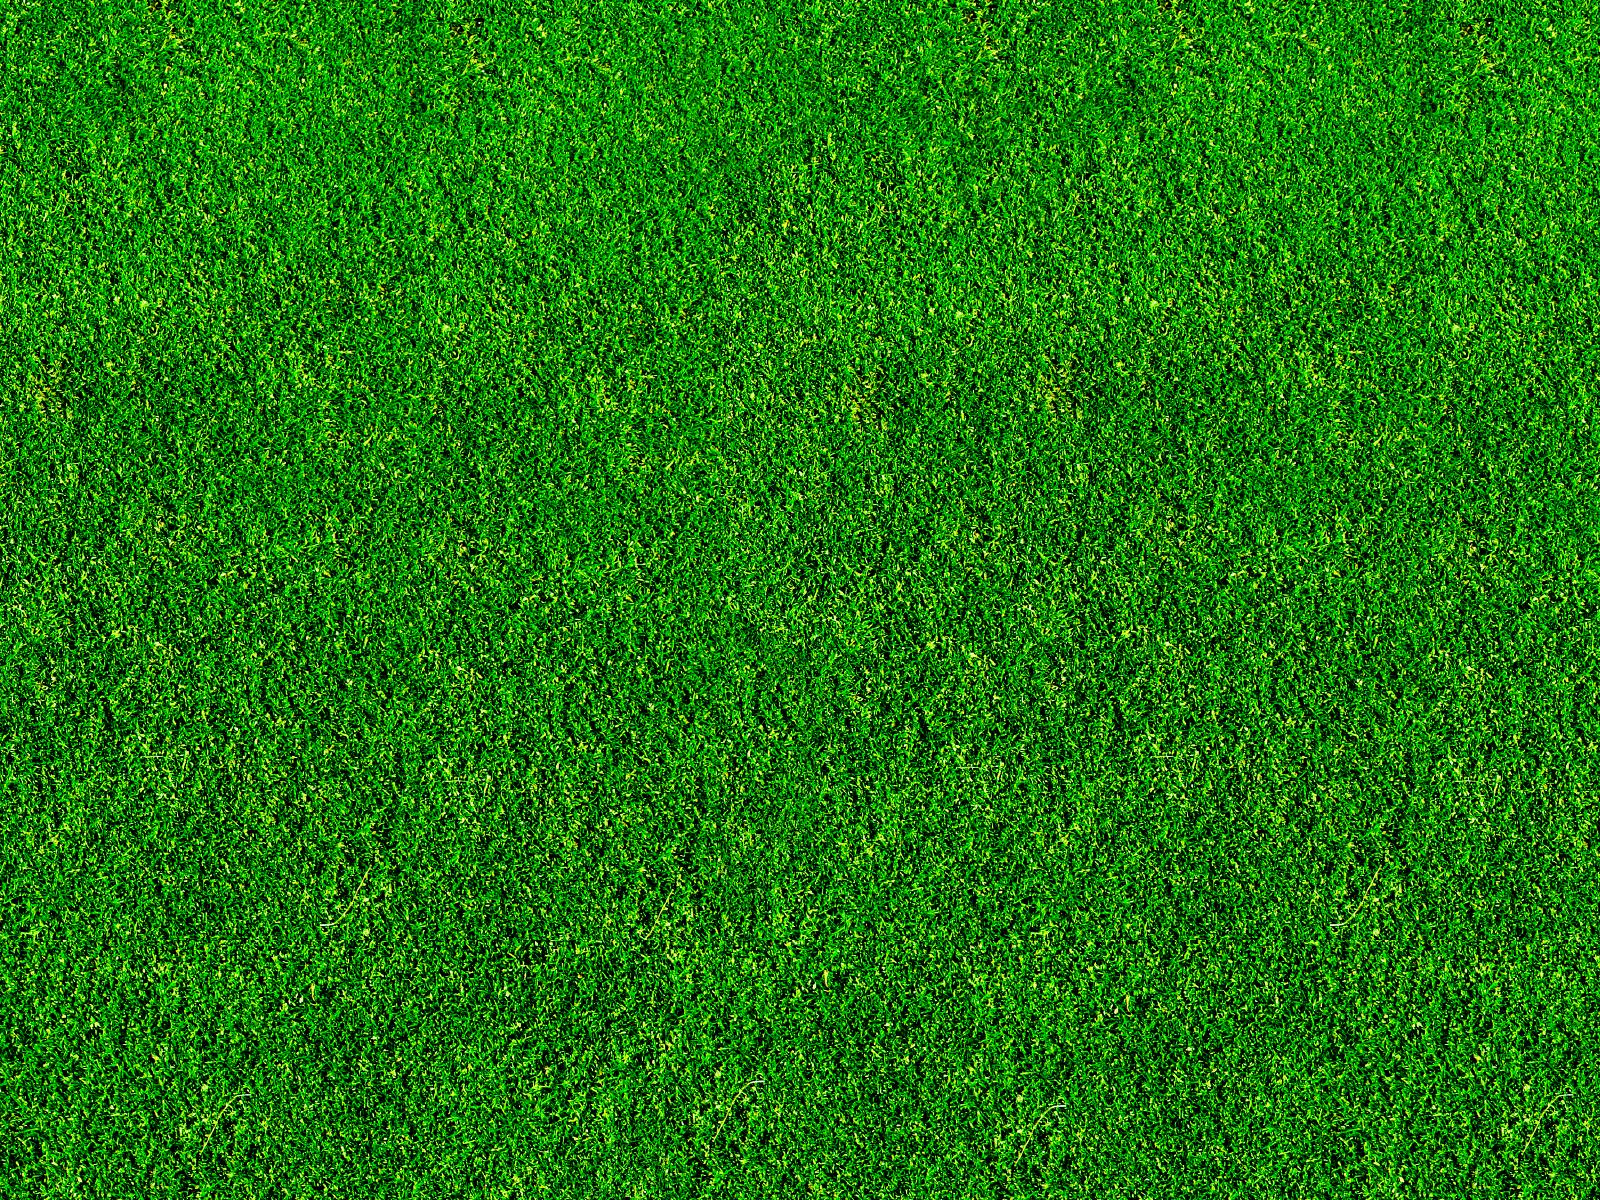 Medium Green Grass Model Train Scenery Sheet | Scenery Sheets - Easy ...